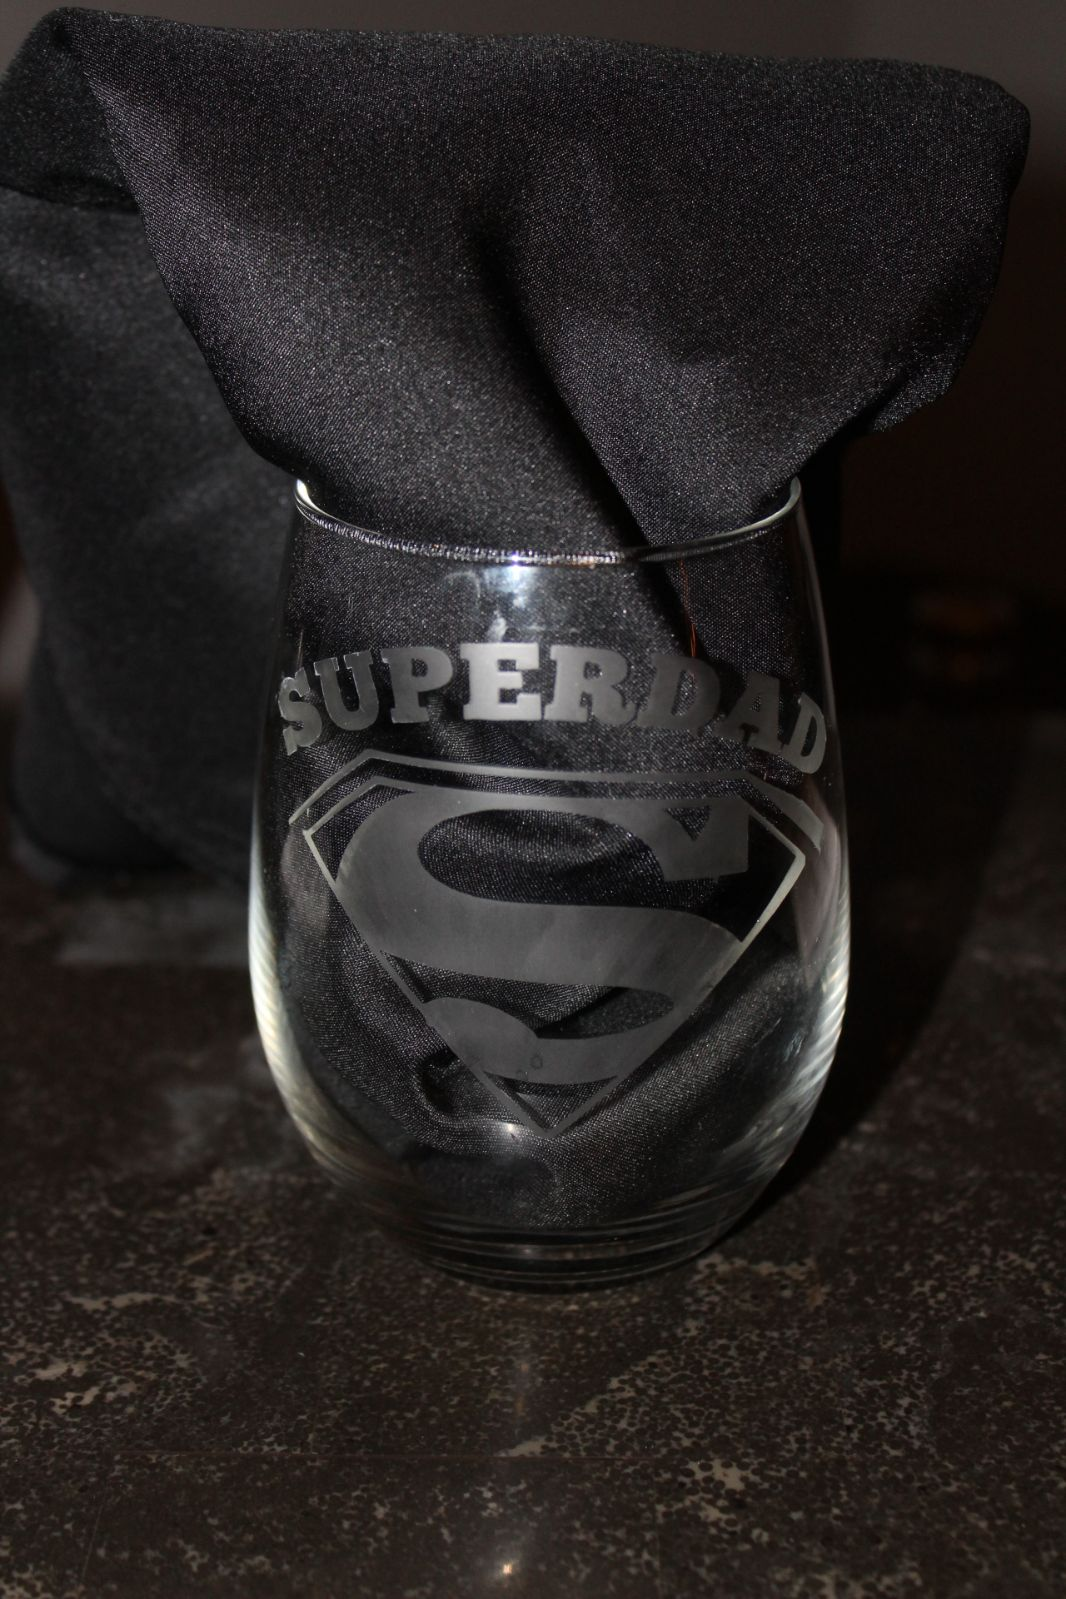 SUPER DAD Glass